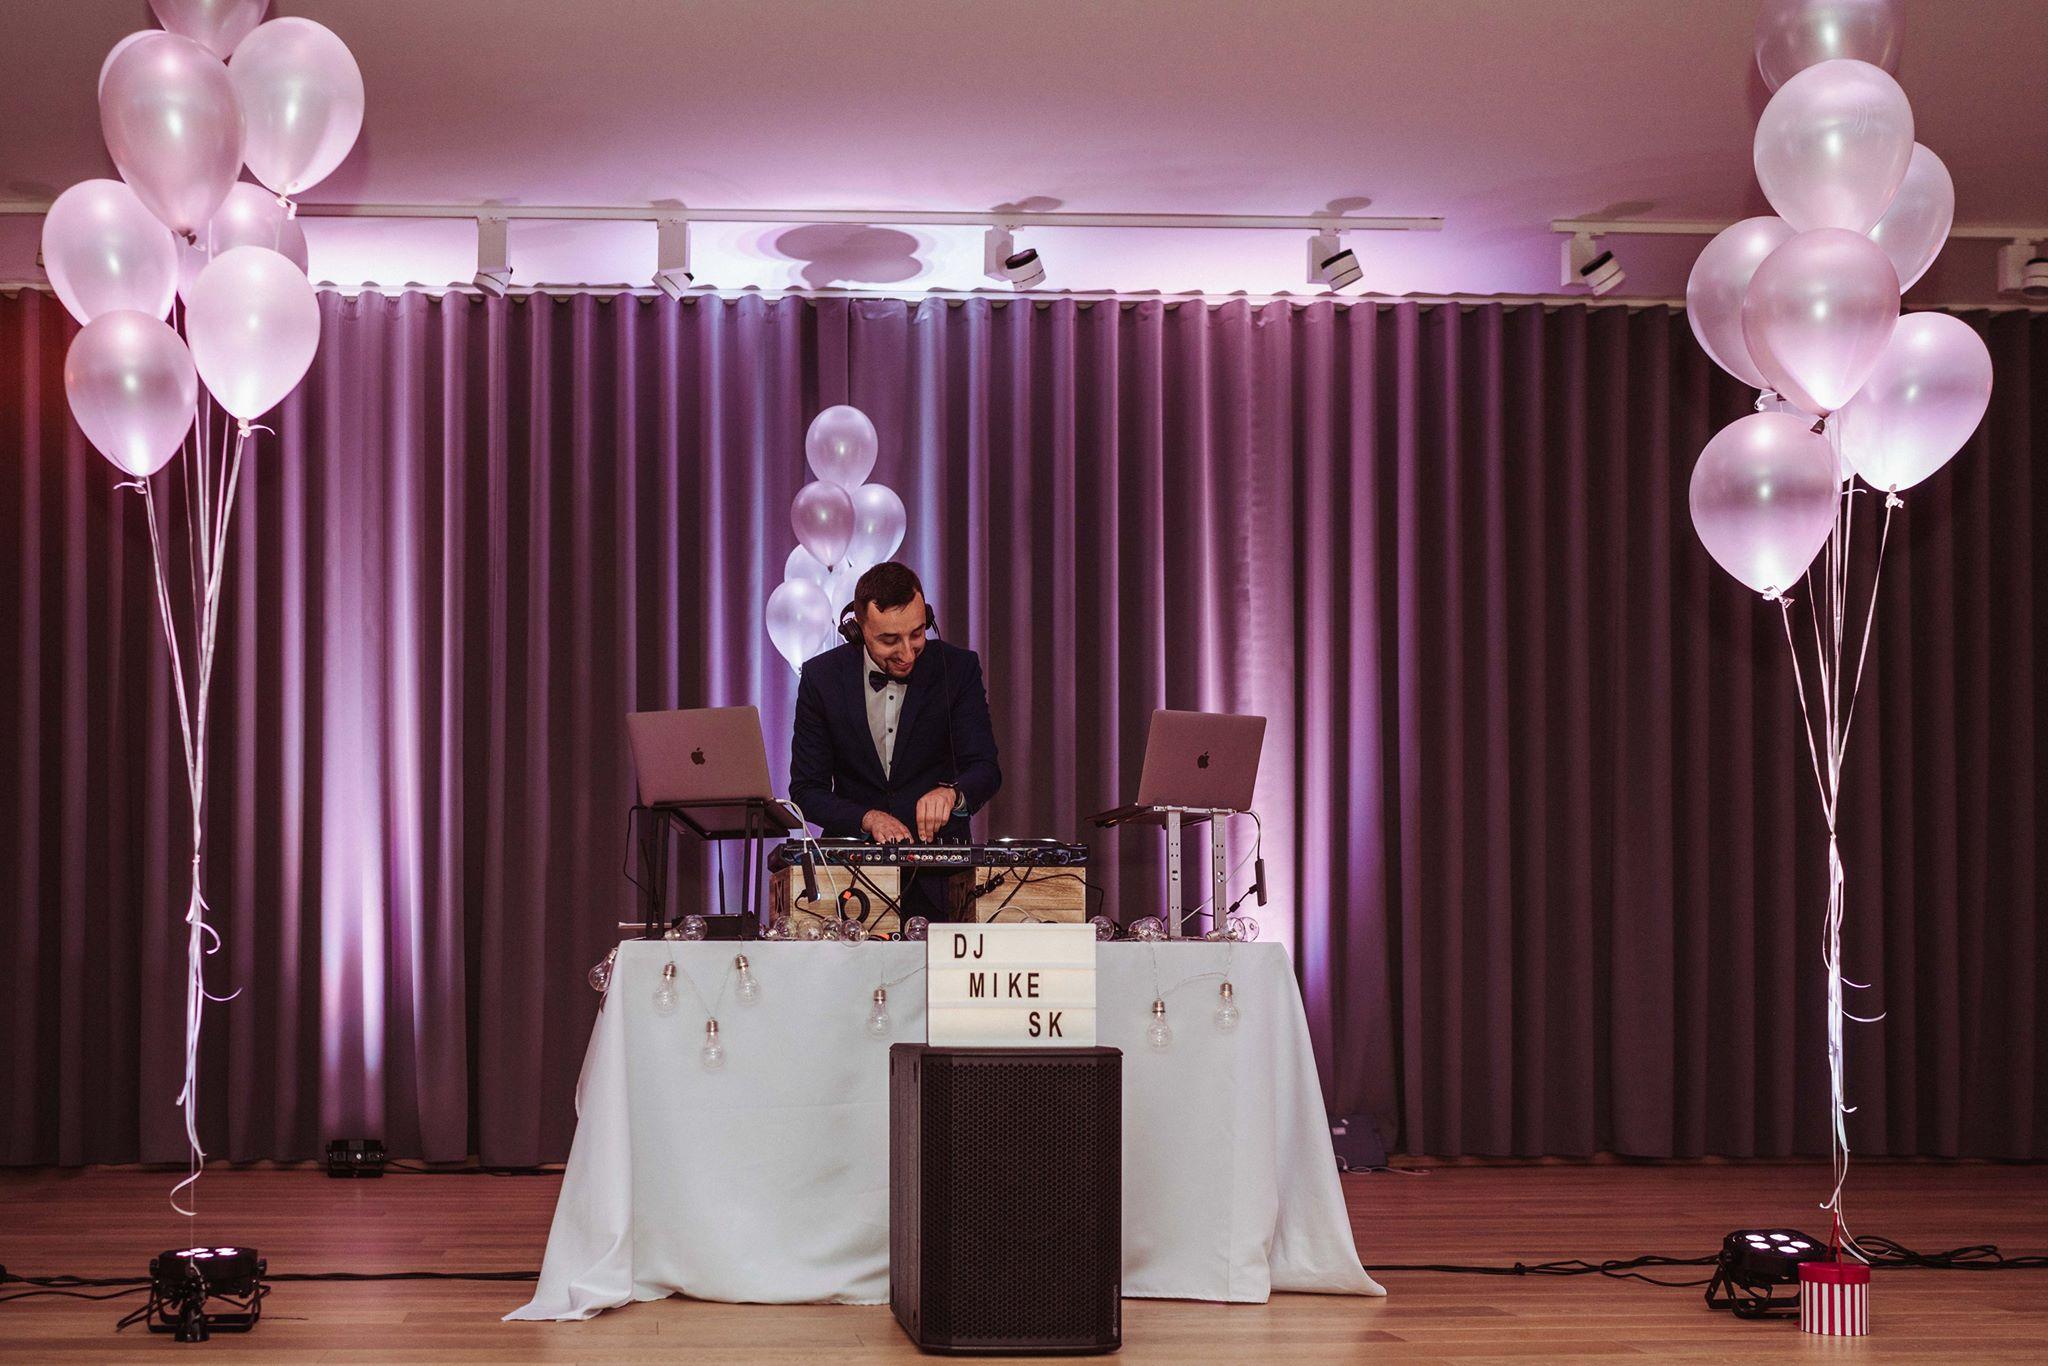 DJ-moderator-starejsi-DJ_Mikejpg